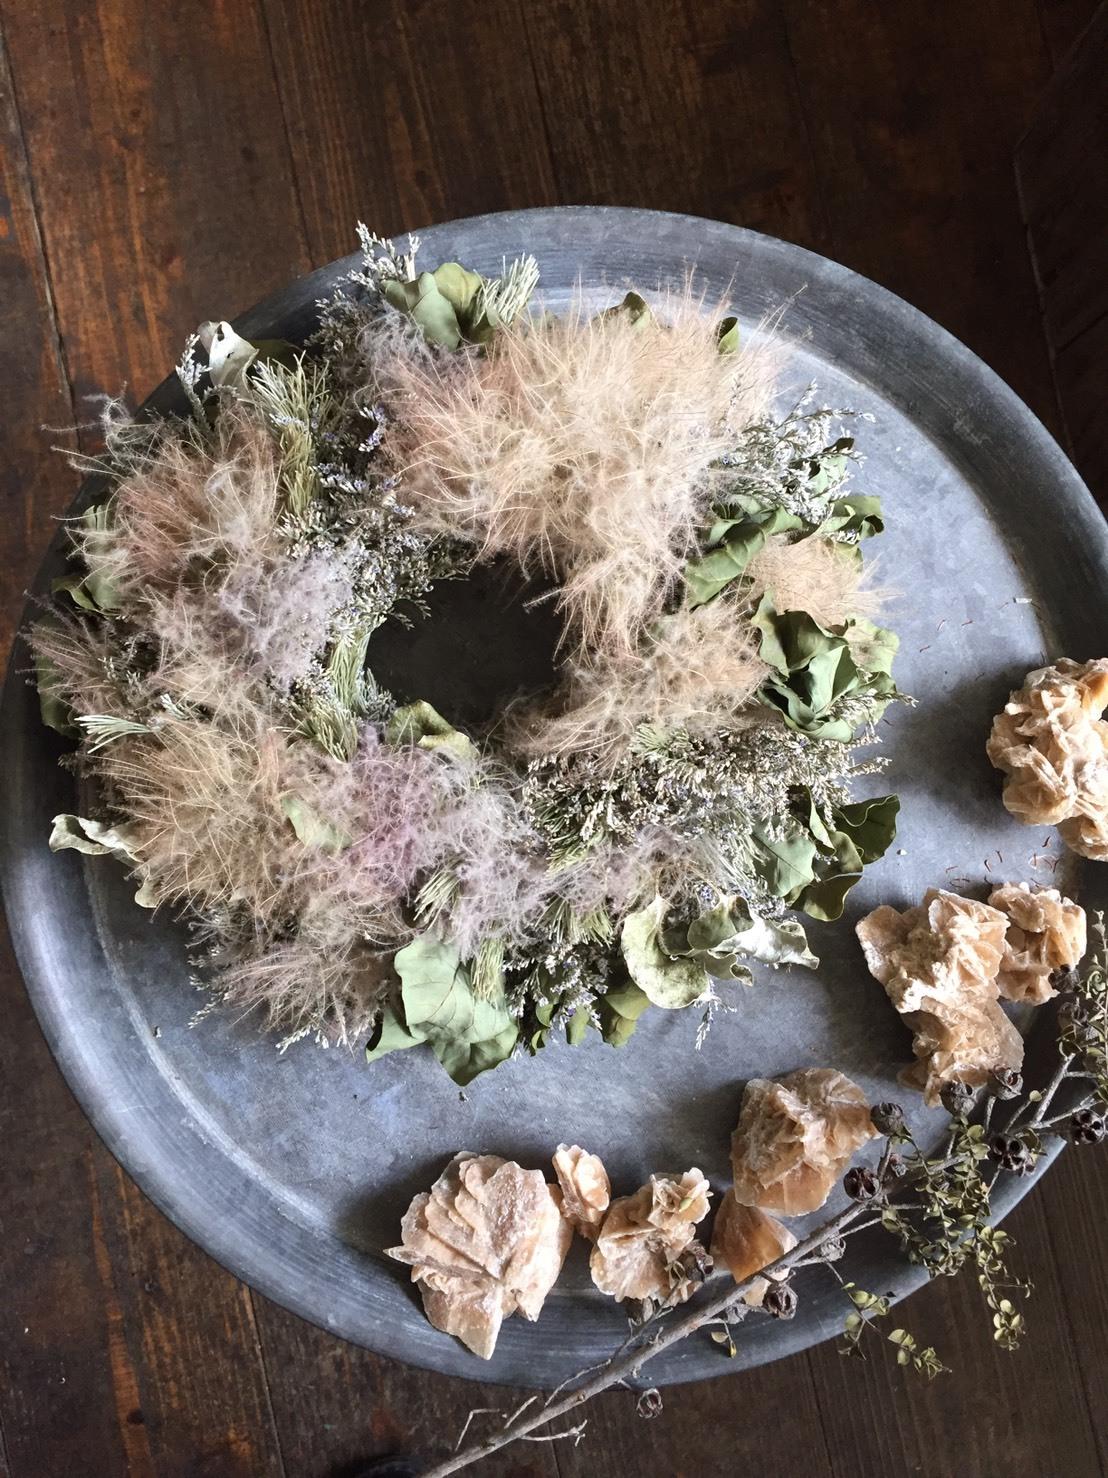 Dried smoketree with sea lavender wreath A (ドライスモークツリーとハイブリッドスターチスのリースA)